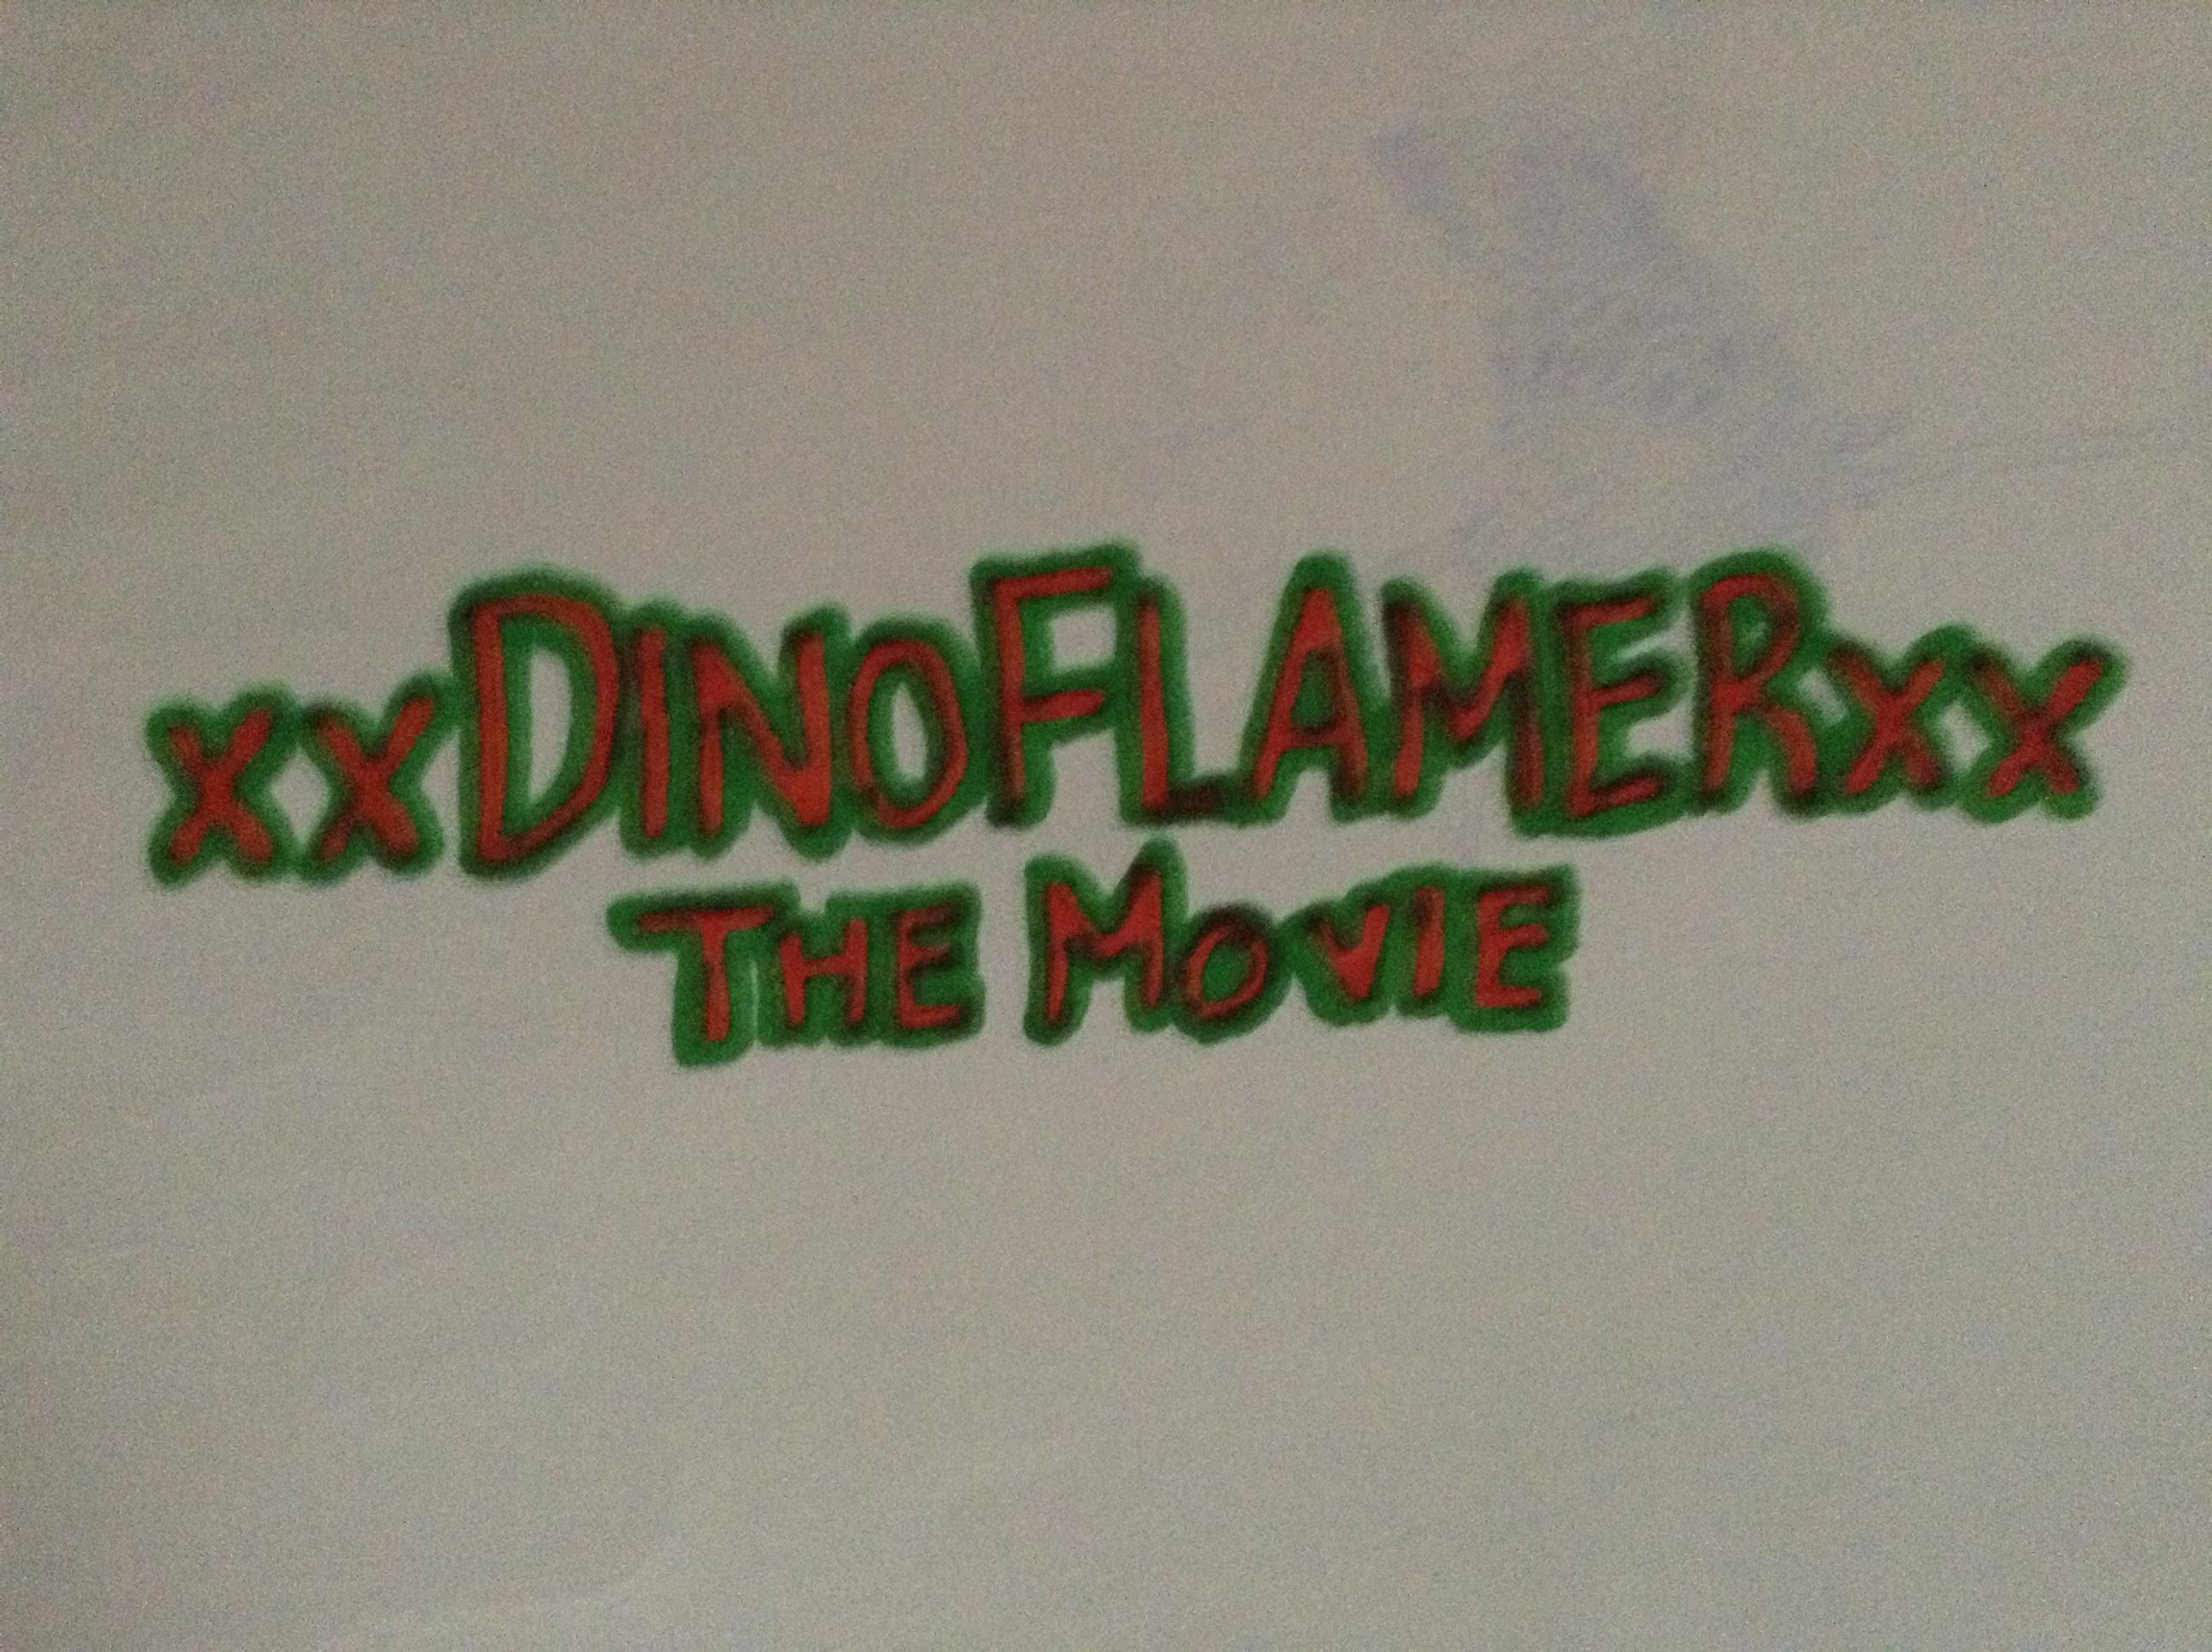 xxDinoFlamerxx -The Movie CONTEST!!! by KittyGenerator4000